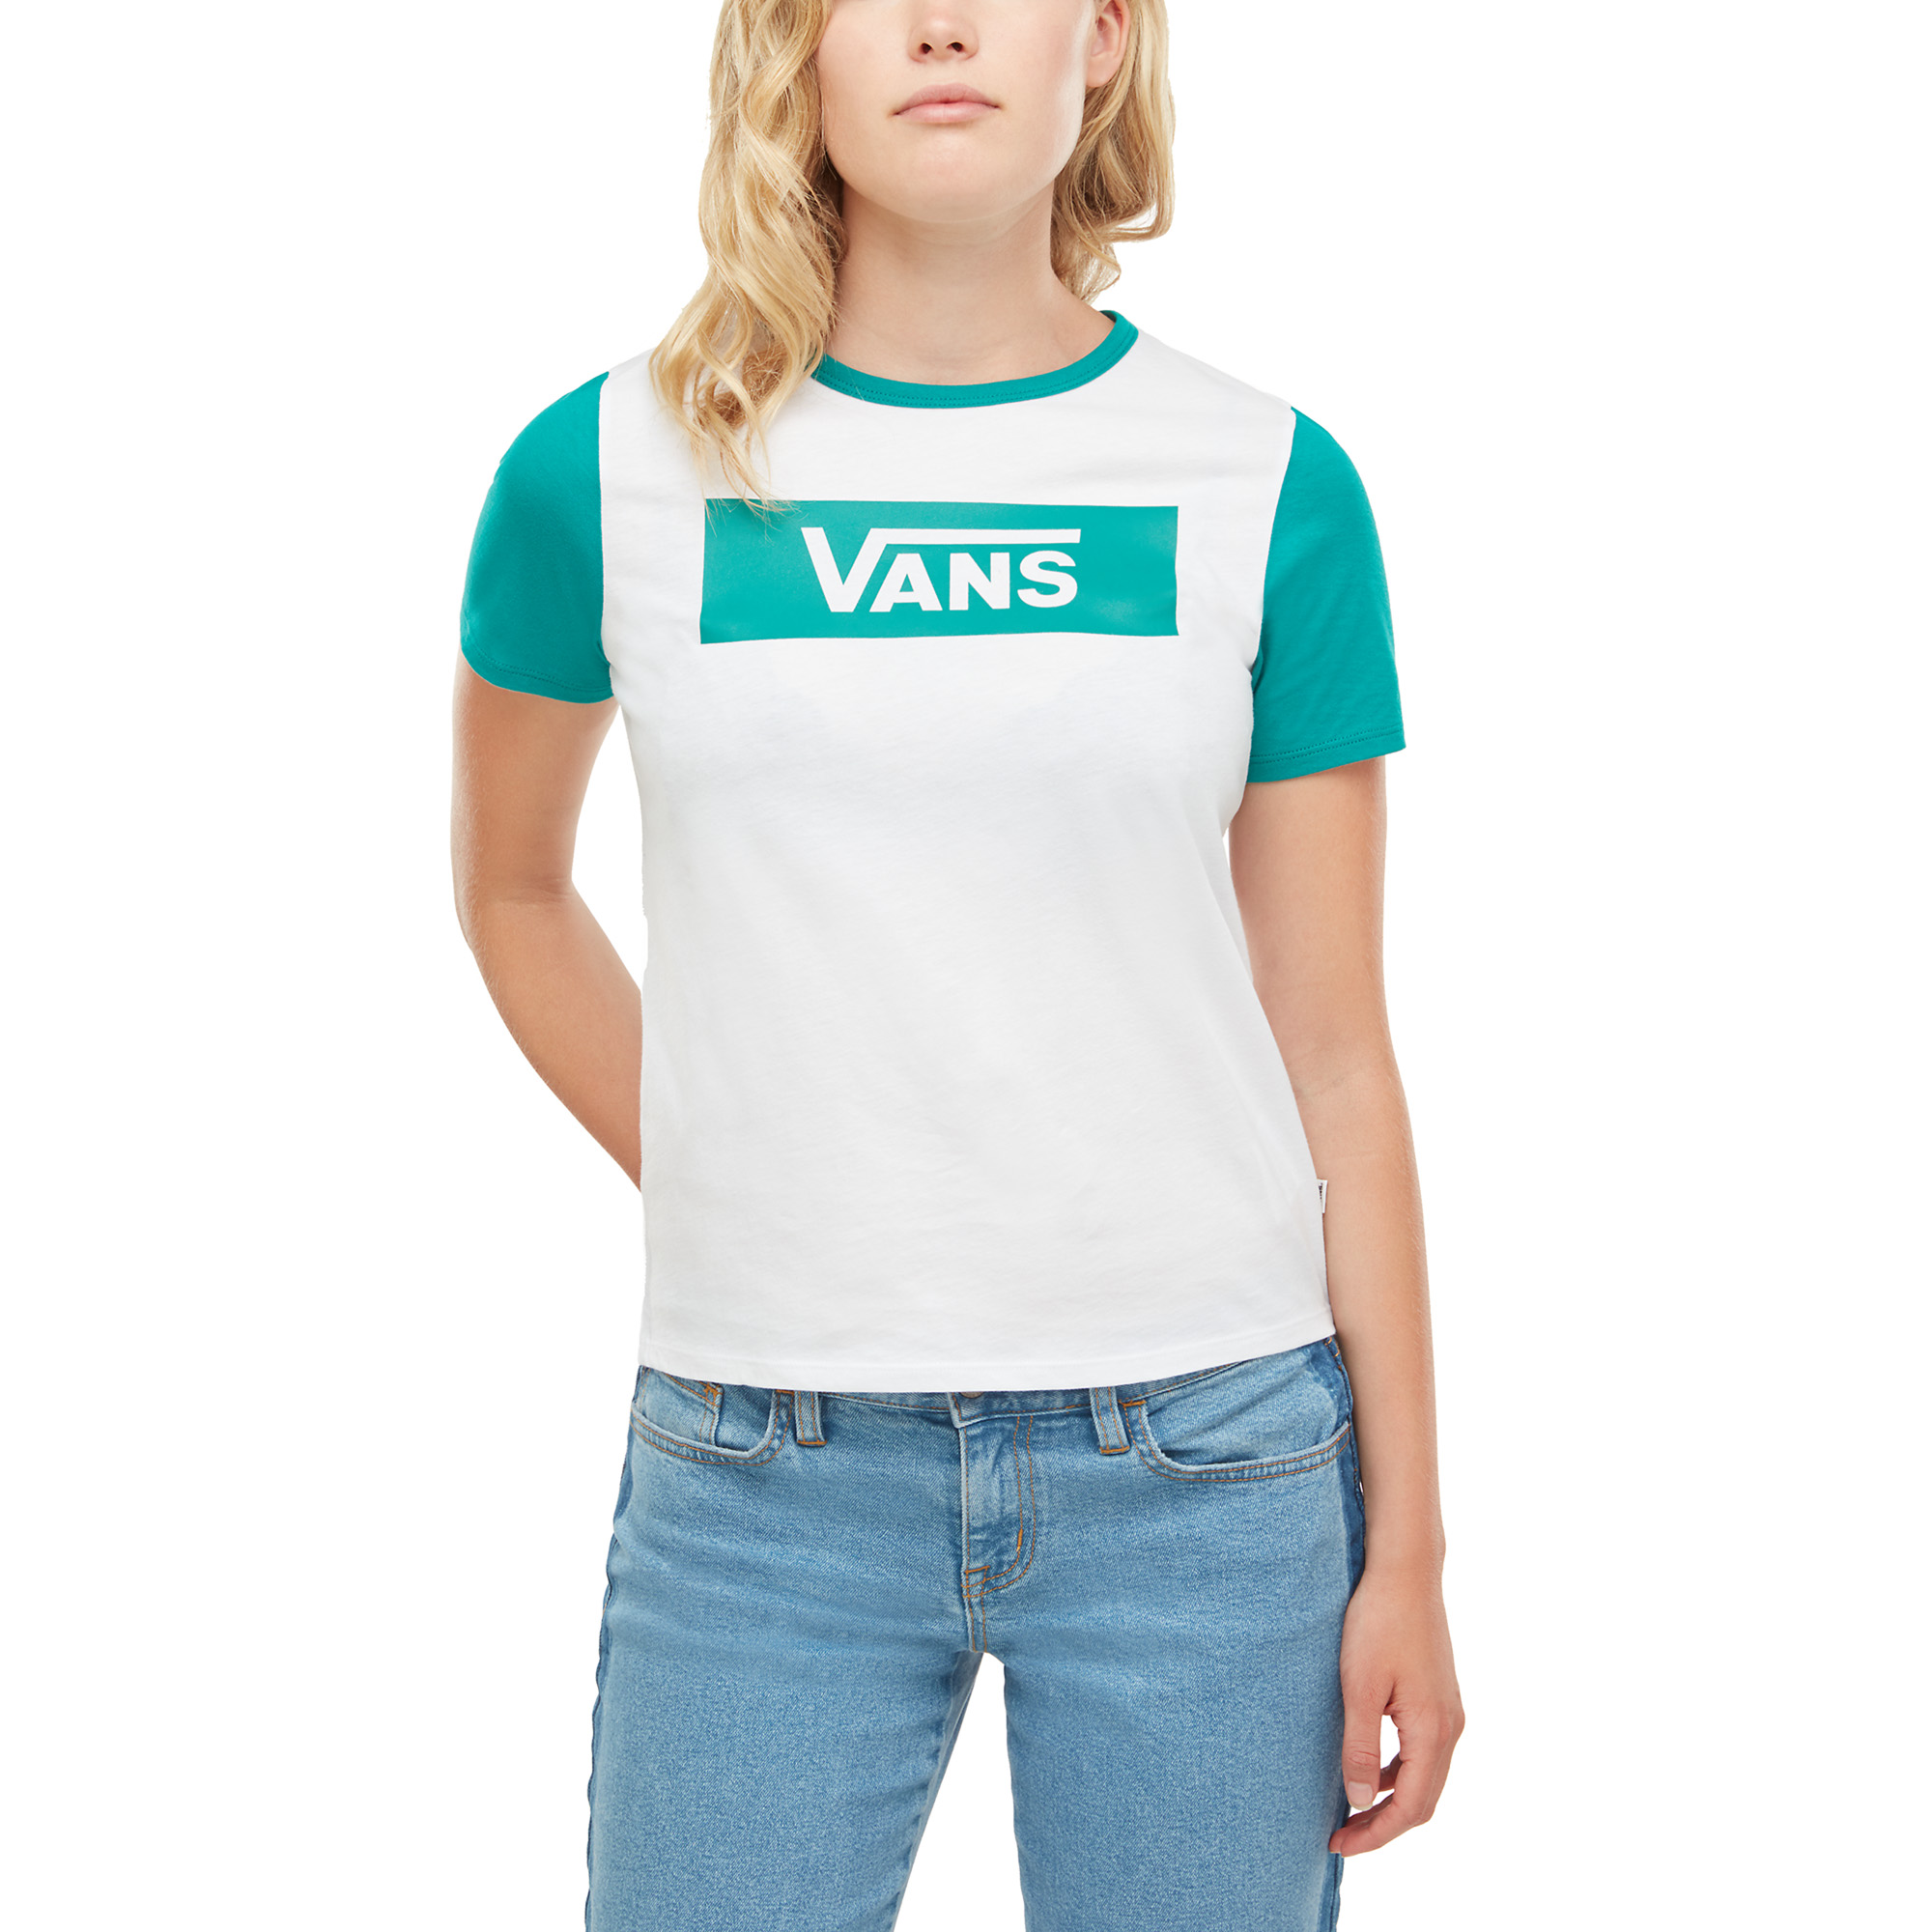 Футболка женская Vans V Tangle Range Ringer, цвет: белый, зеленый. VA3ULLUWJ. Размер XS (40) футболка женская mustang цвет светло серый 1005500 4141 размер xs 40